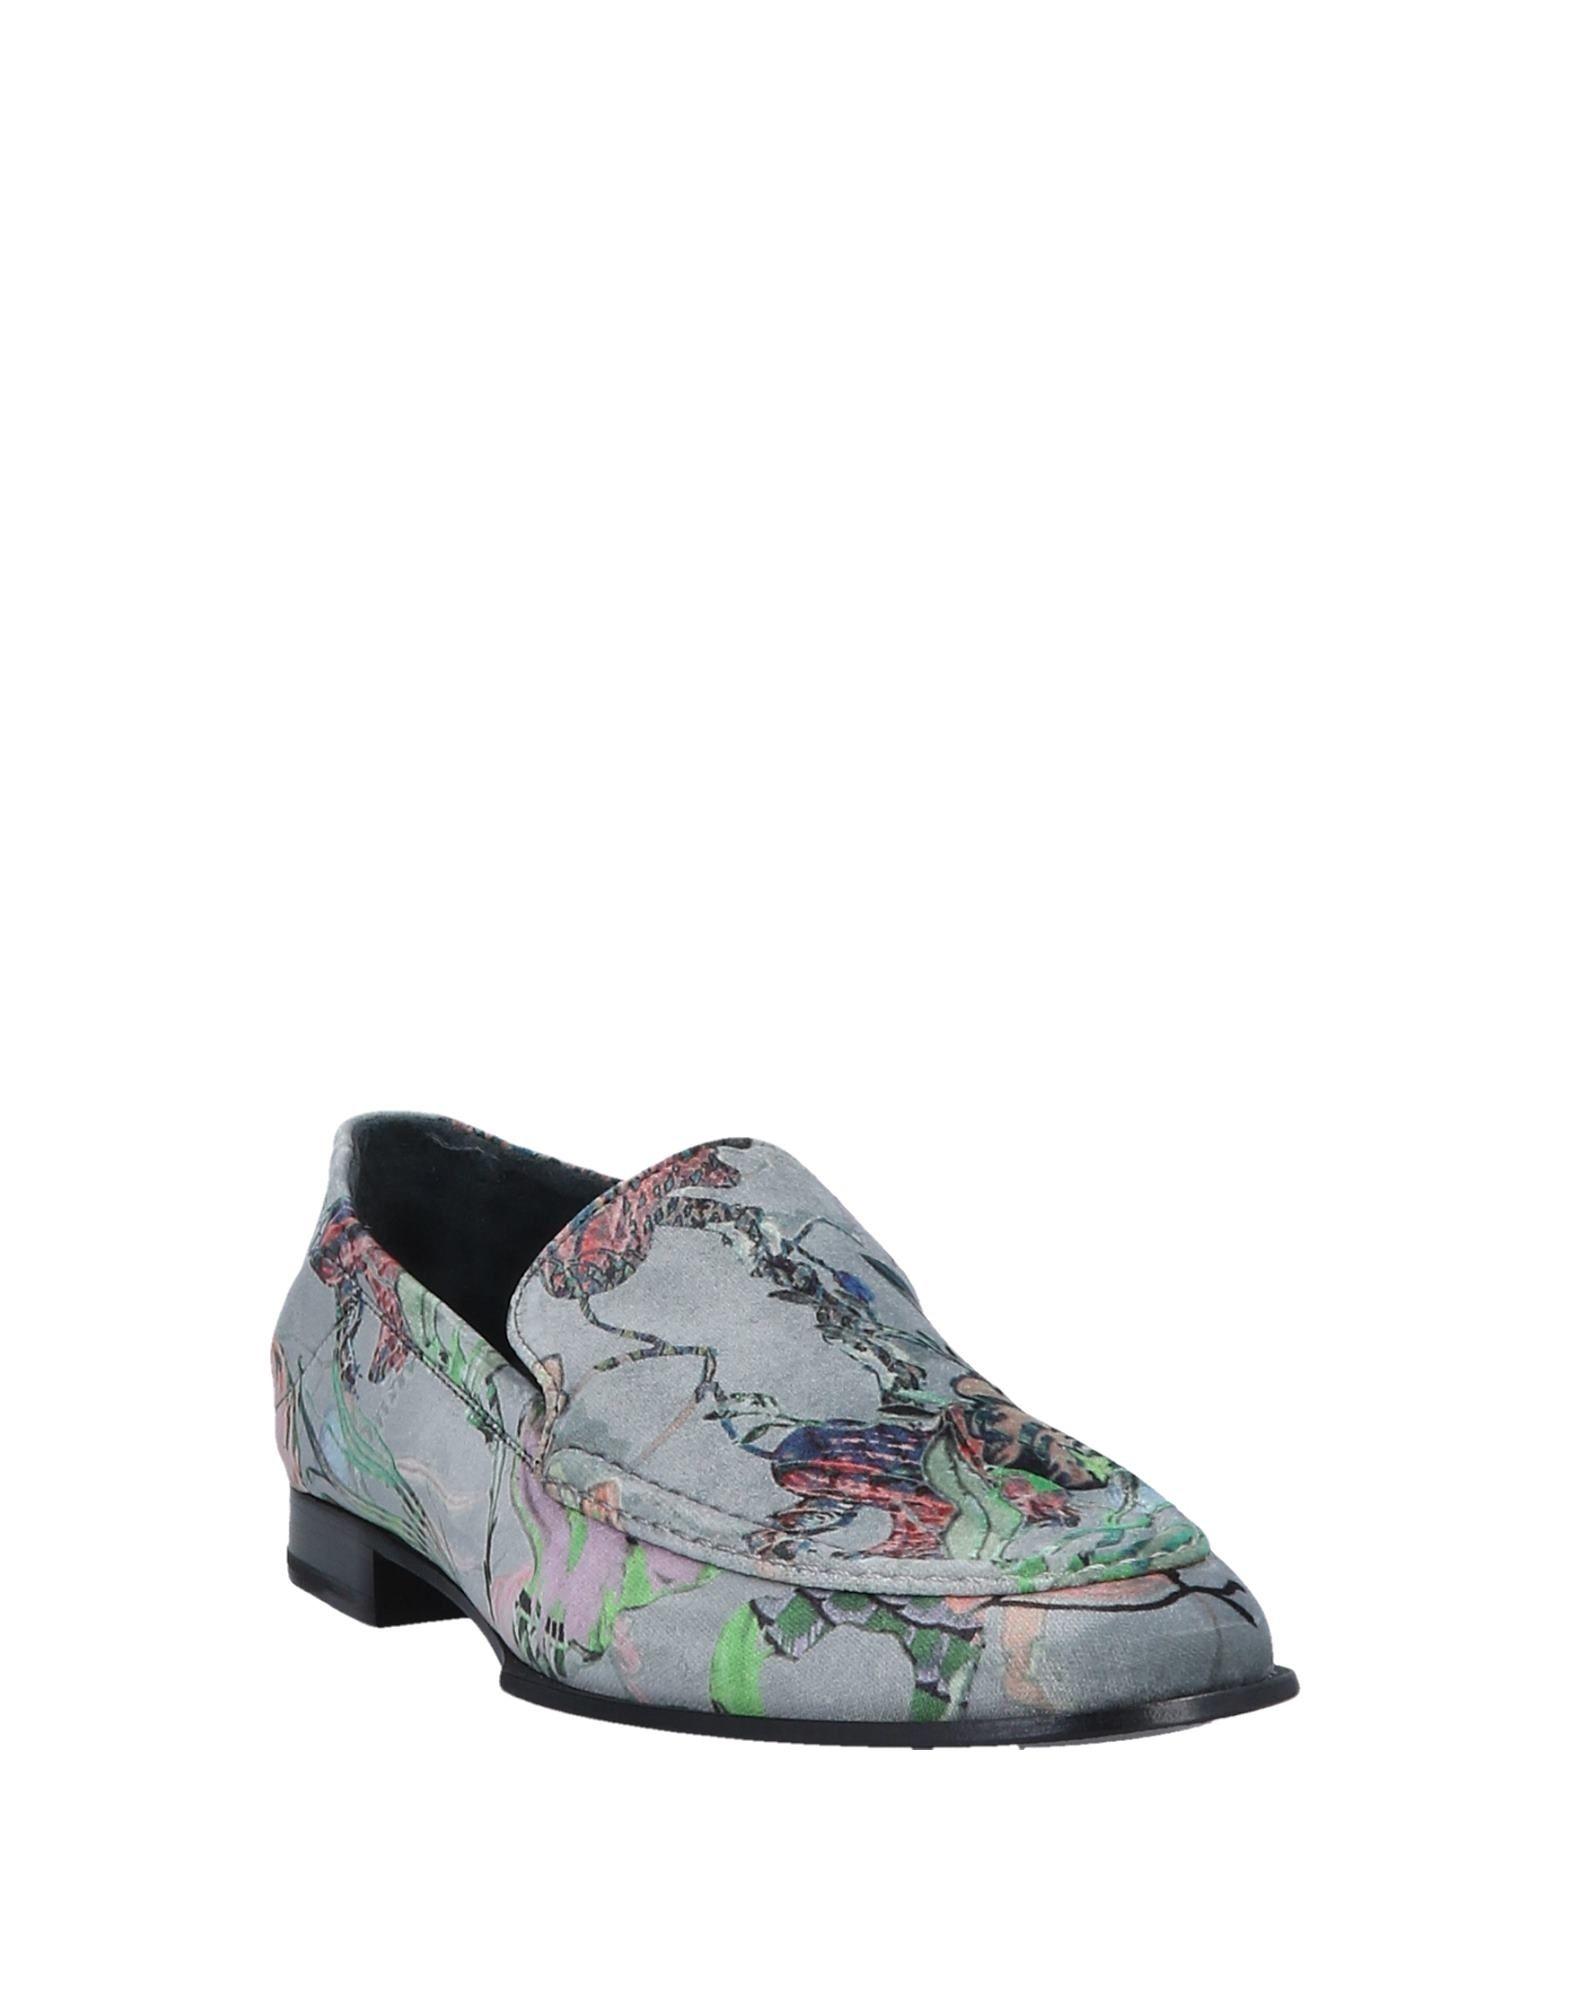 Rabatt Bone Schuhe Rag & Bone Rabatt Mokassins Damen  11572516FG af6632